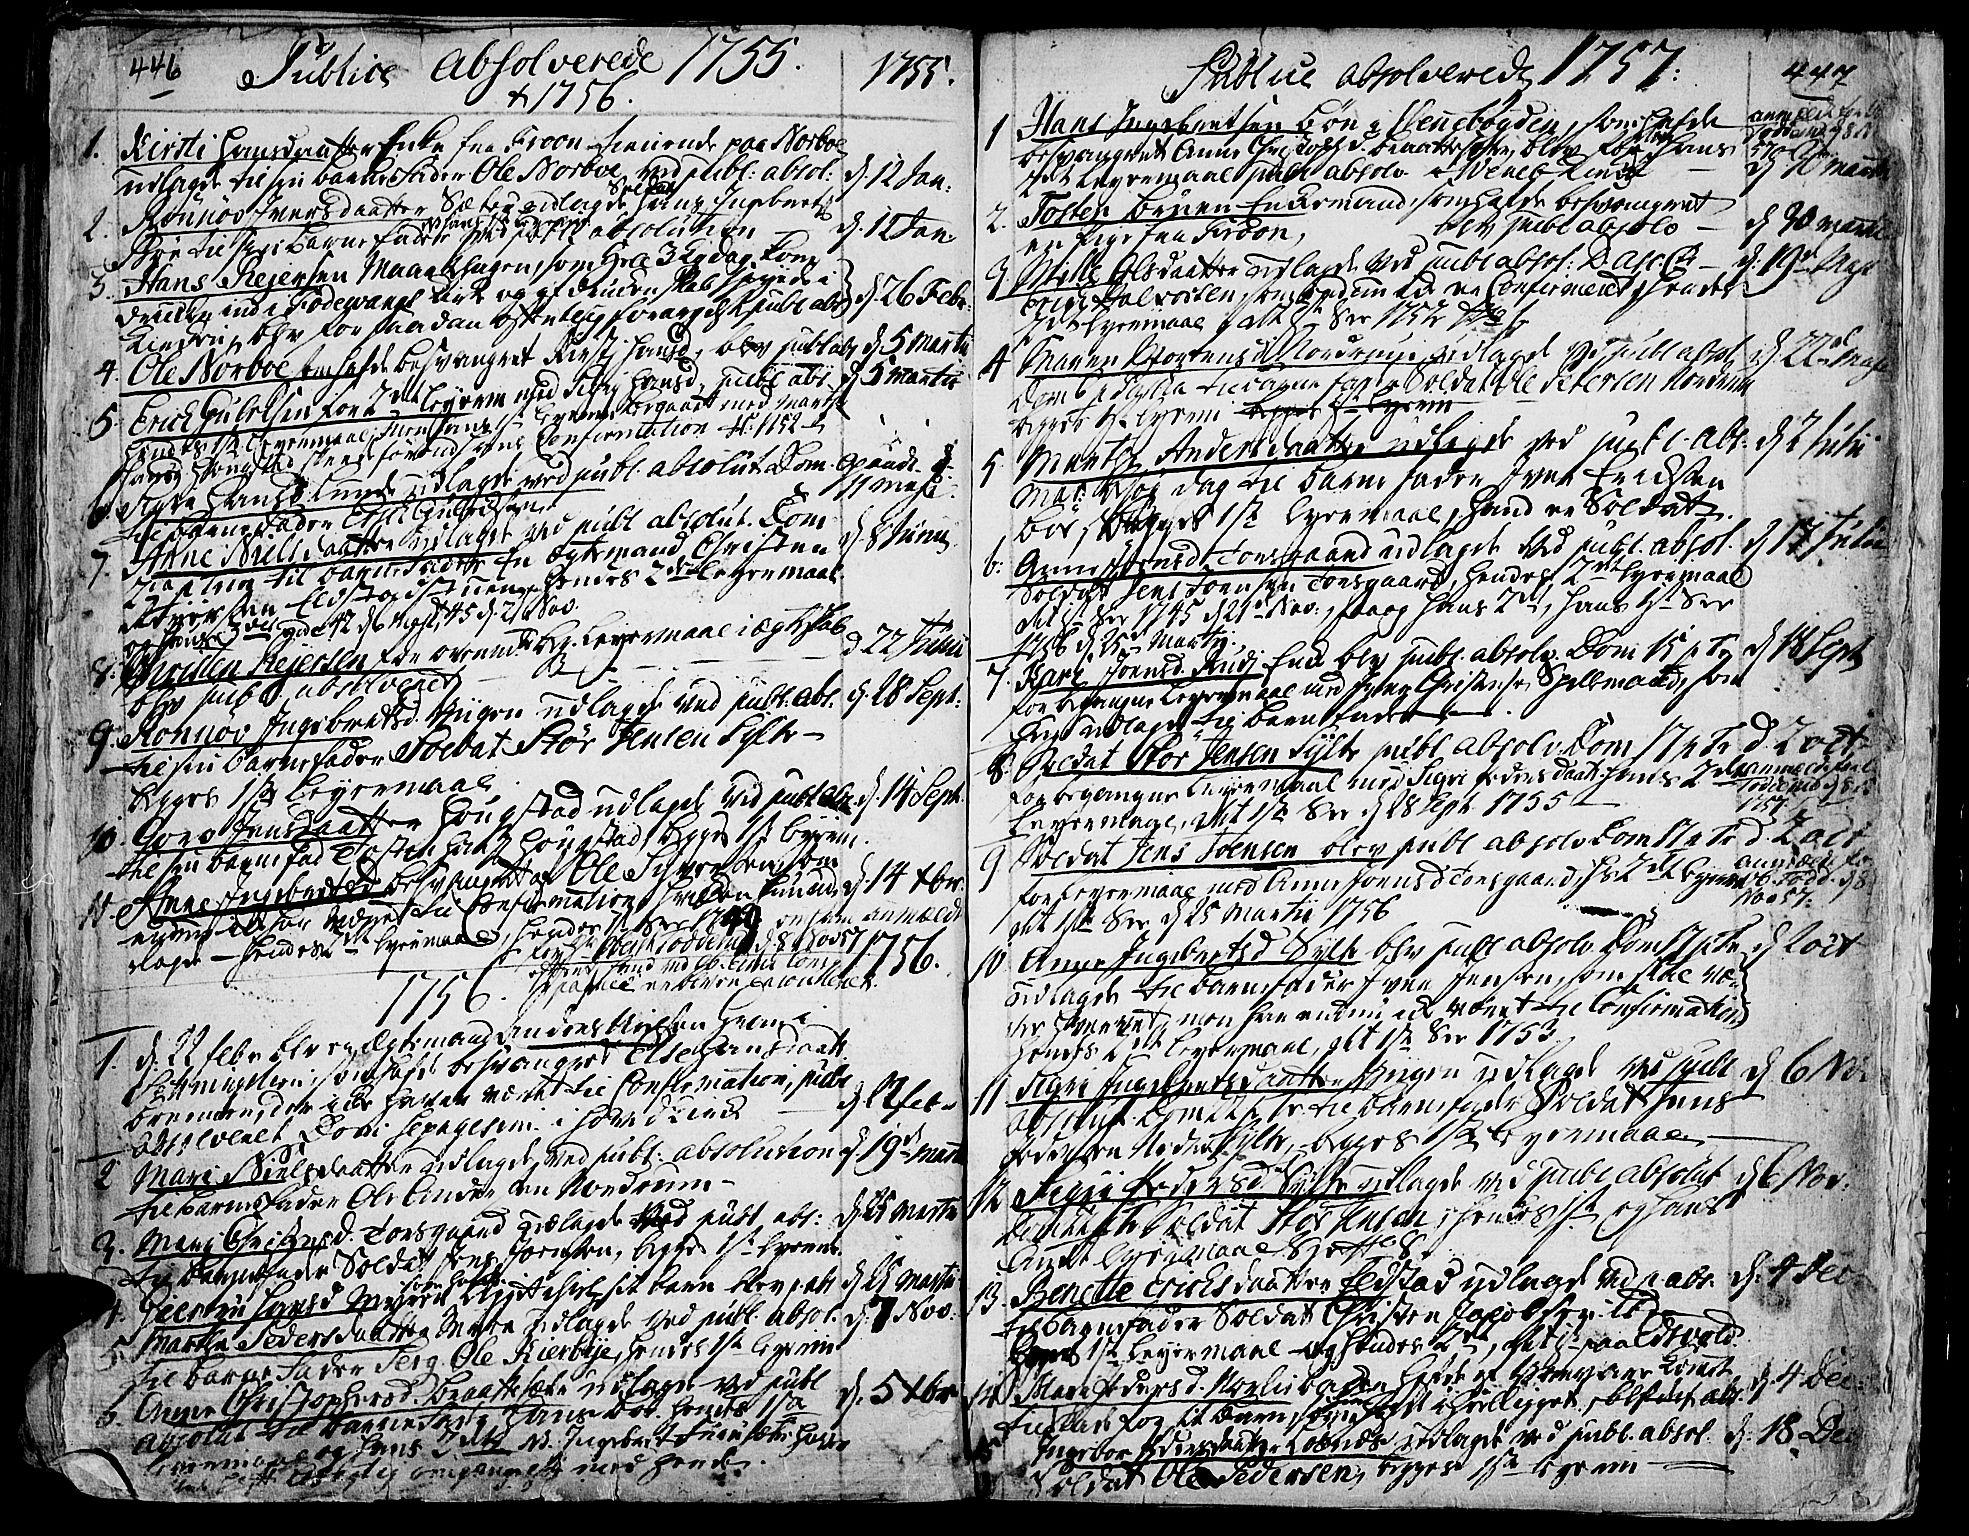 SAH, Ringebu prestekontor, Ministerialbok nr. 2, 1734-1780, s. 446-447